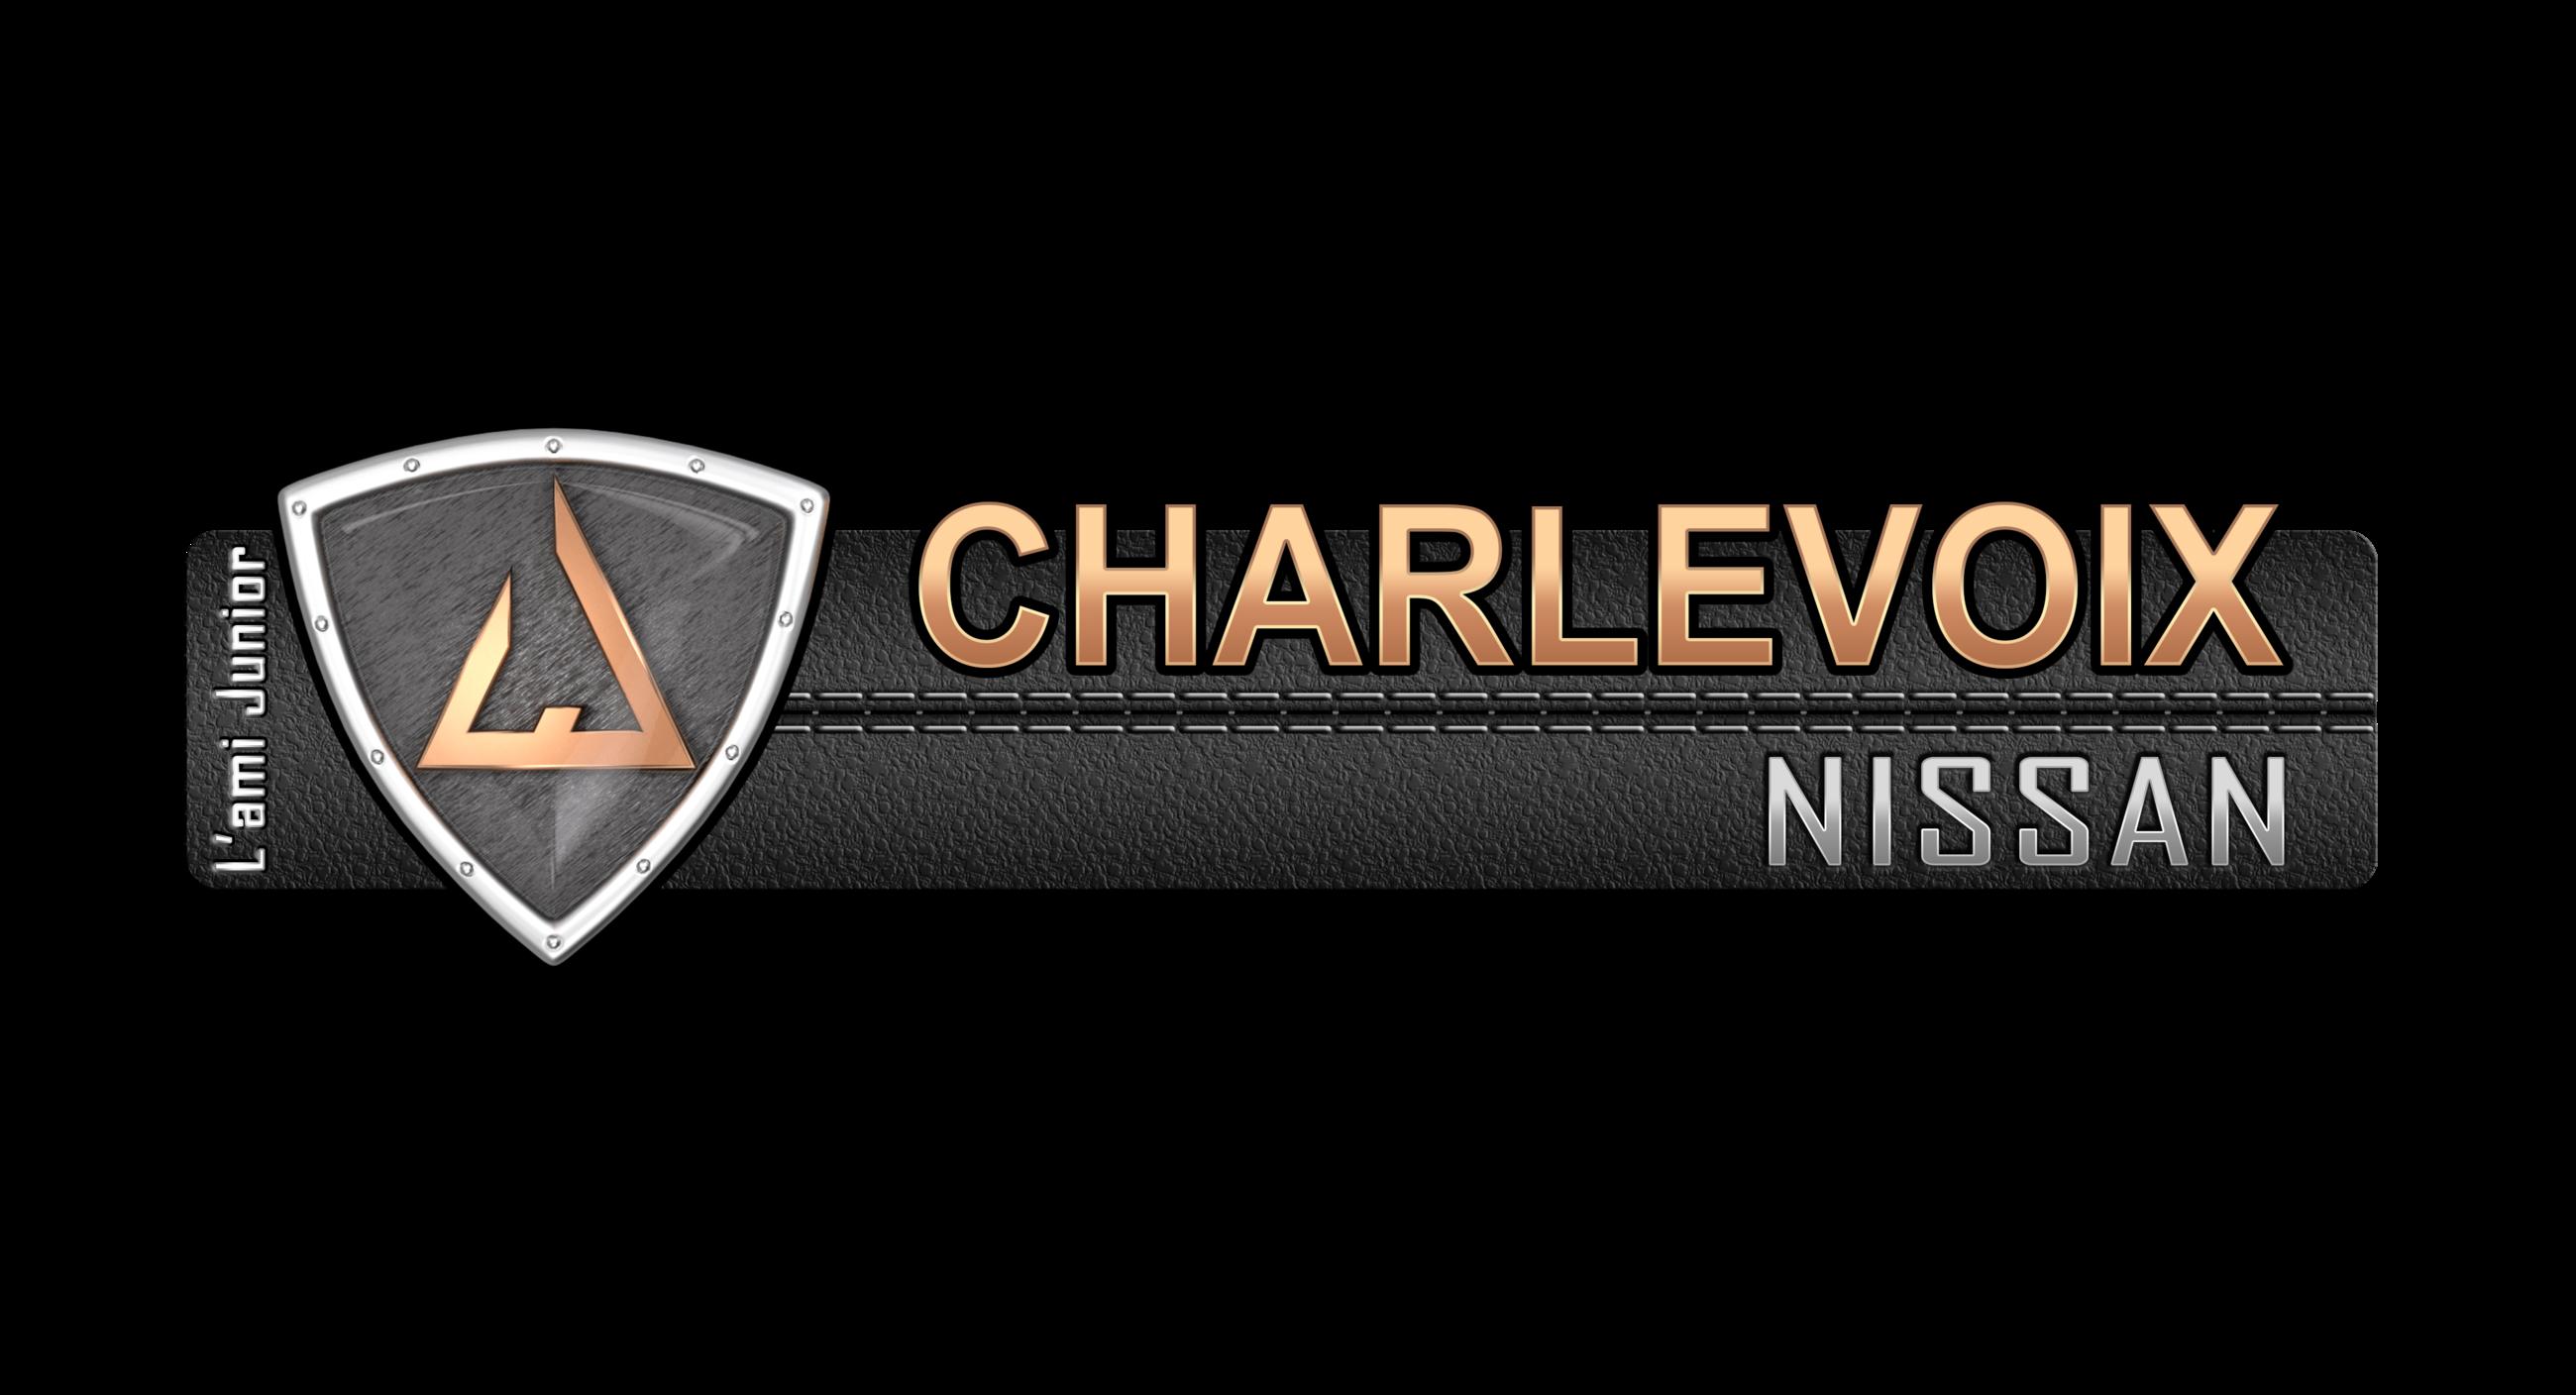 Charlevoix Nissan